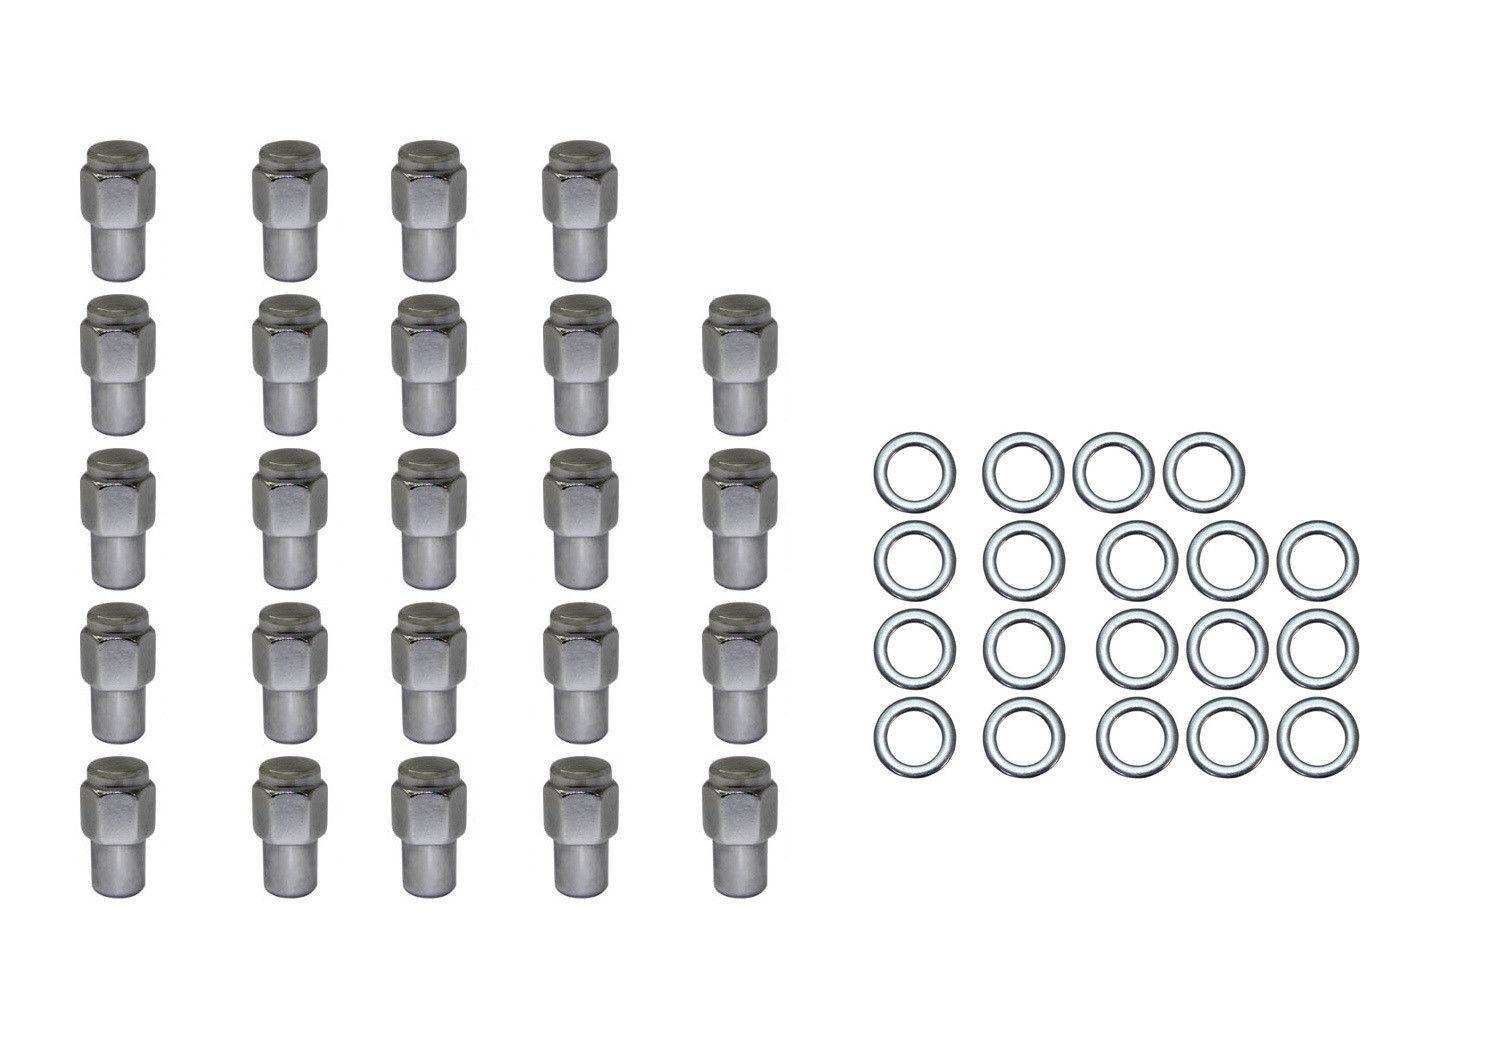 24 Pc Set Chrome Steel Mag Shank Lug Nuts 12mm X 1 25 For